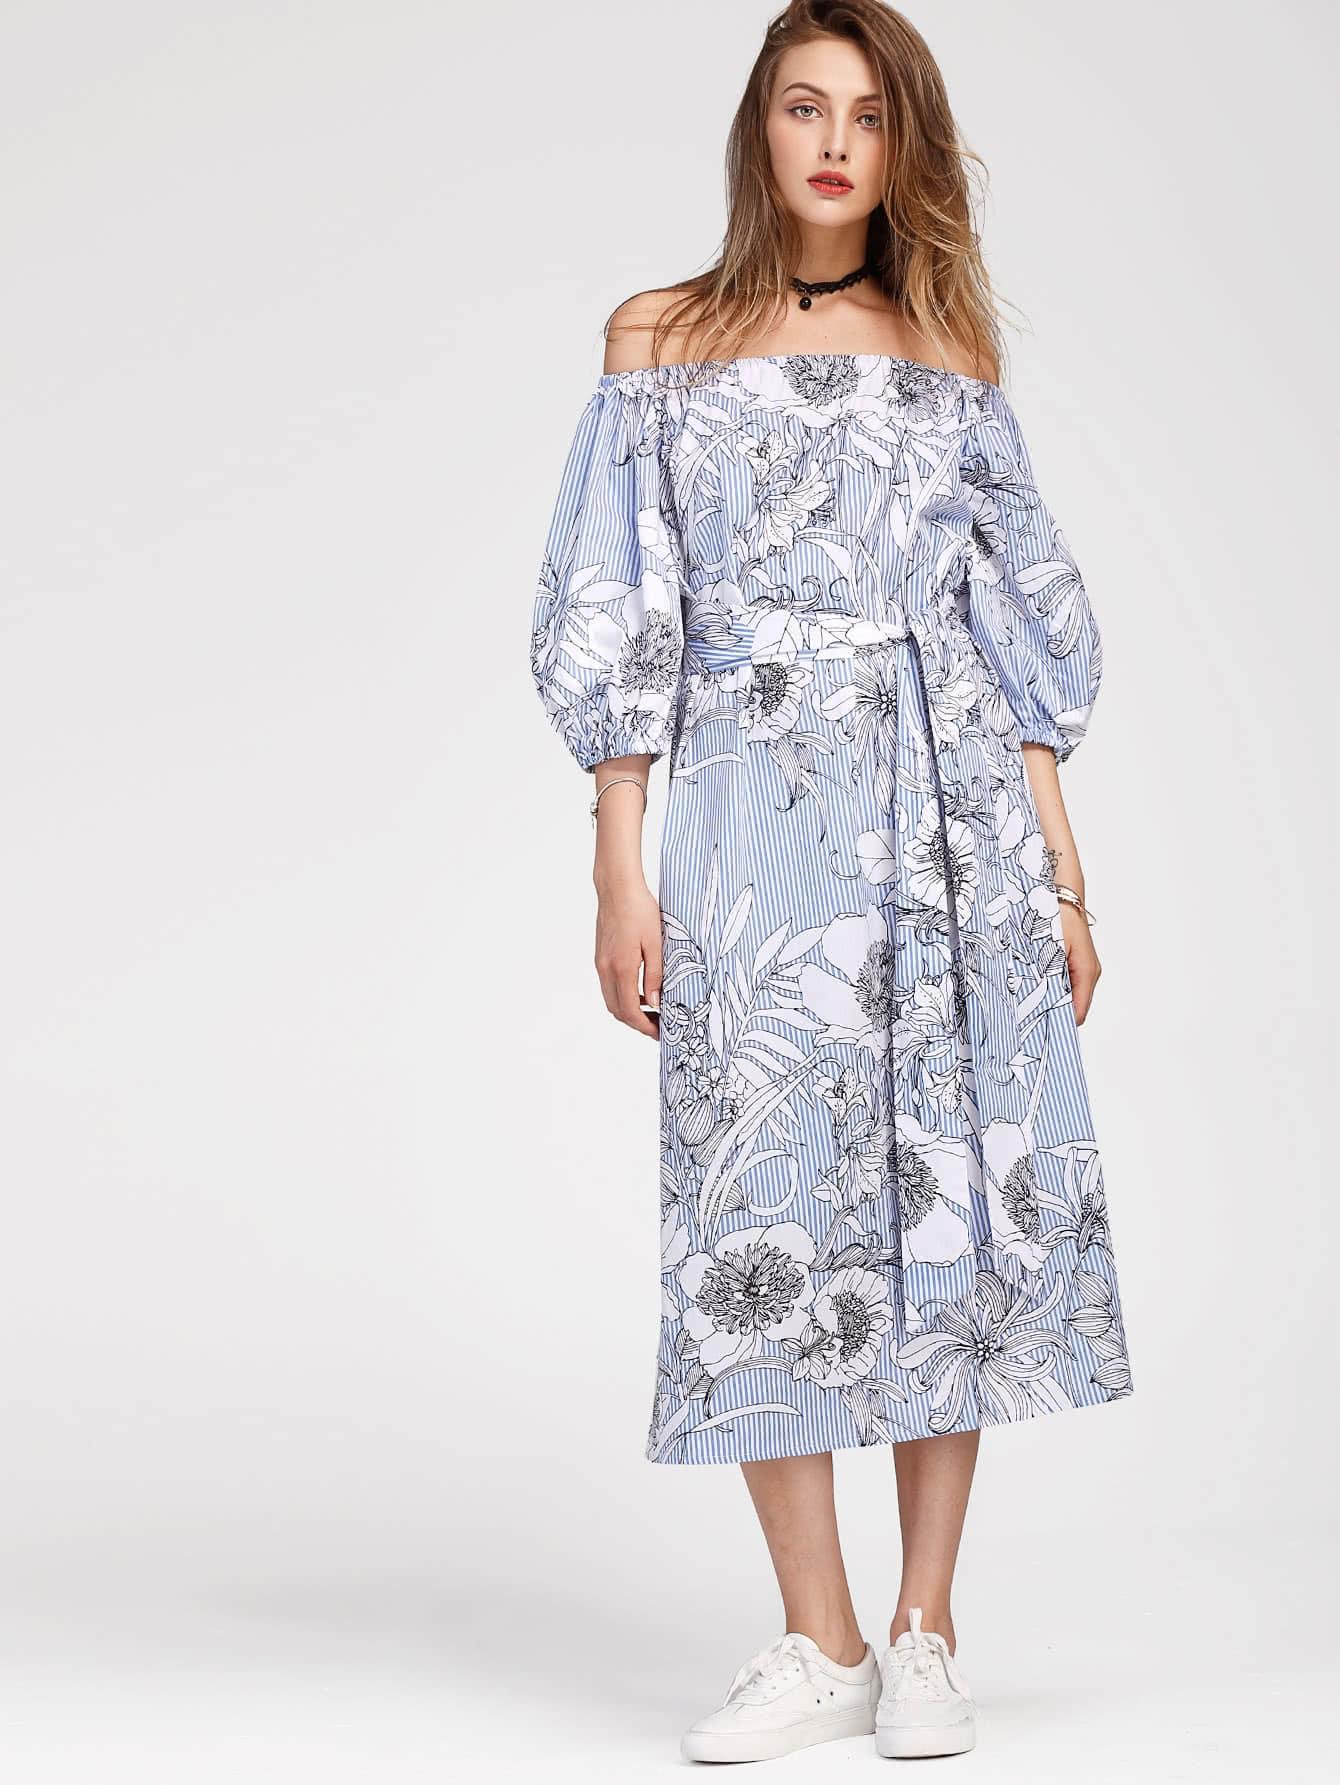 Bardot Lantern Sleeve Vertical Striped Florals Dress